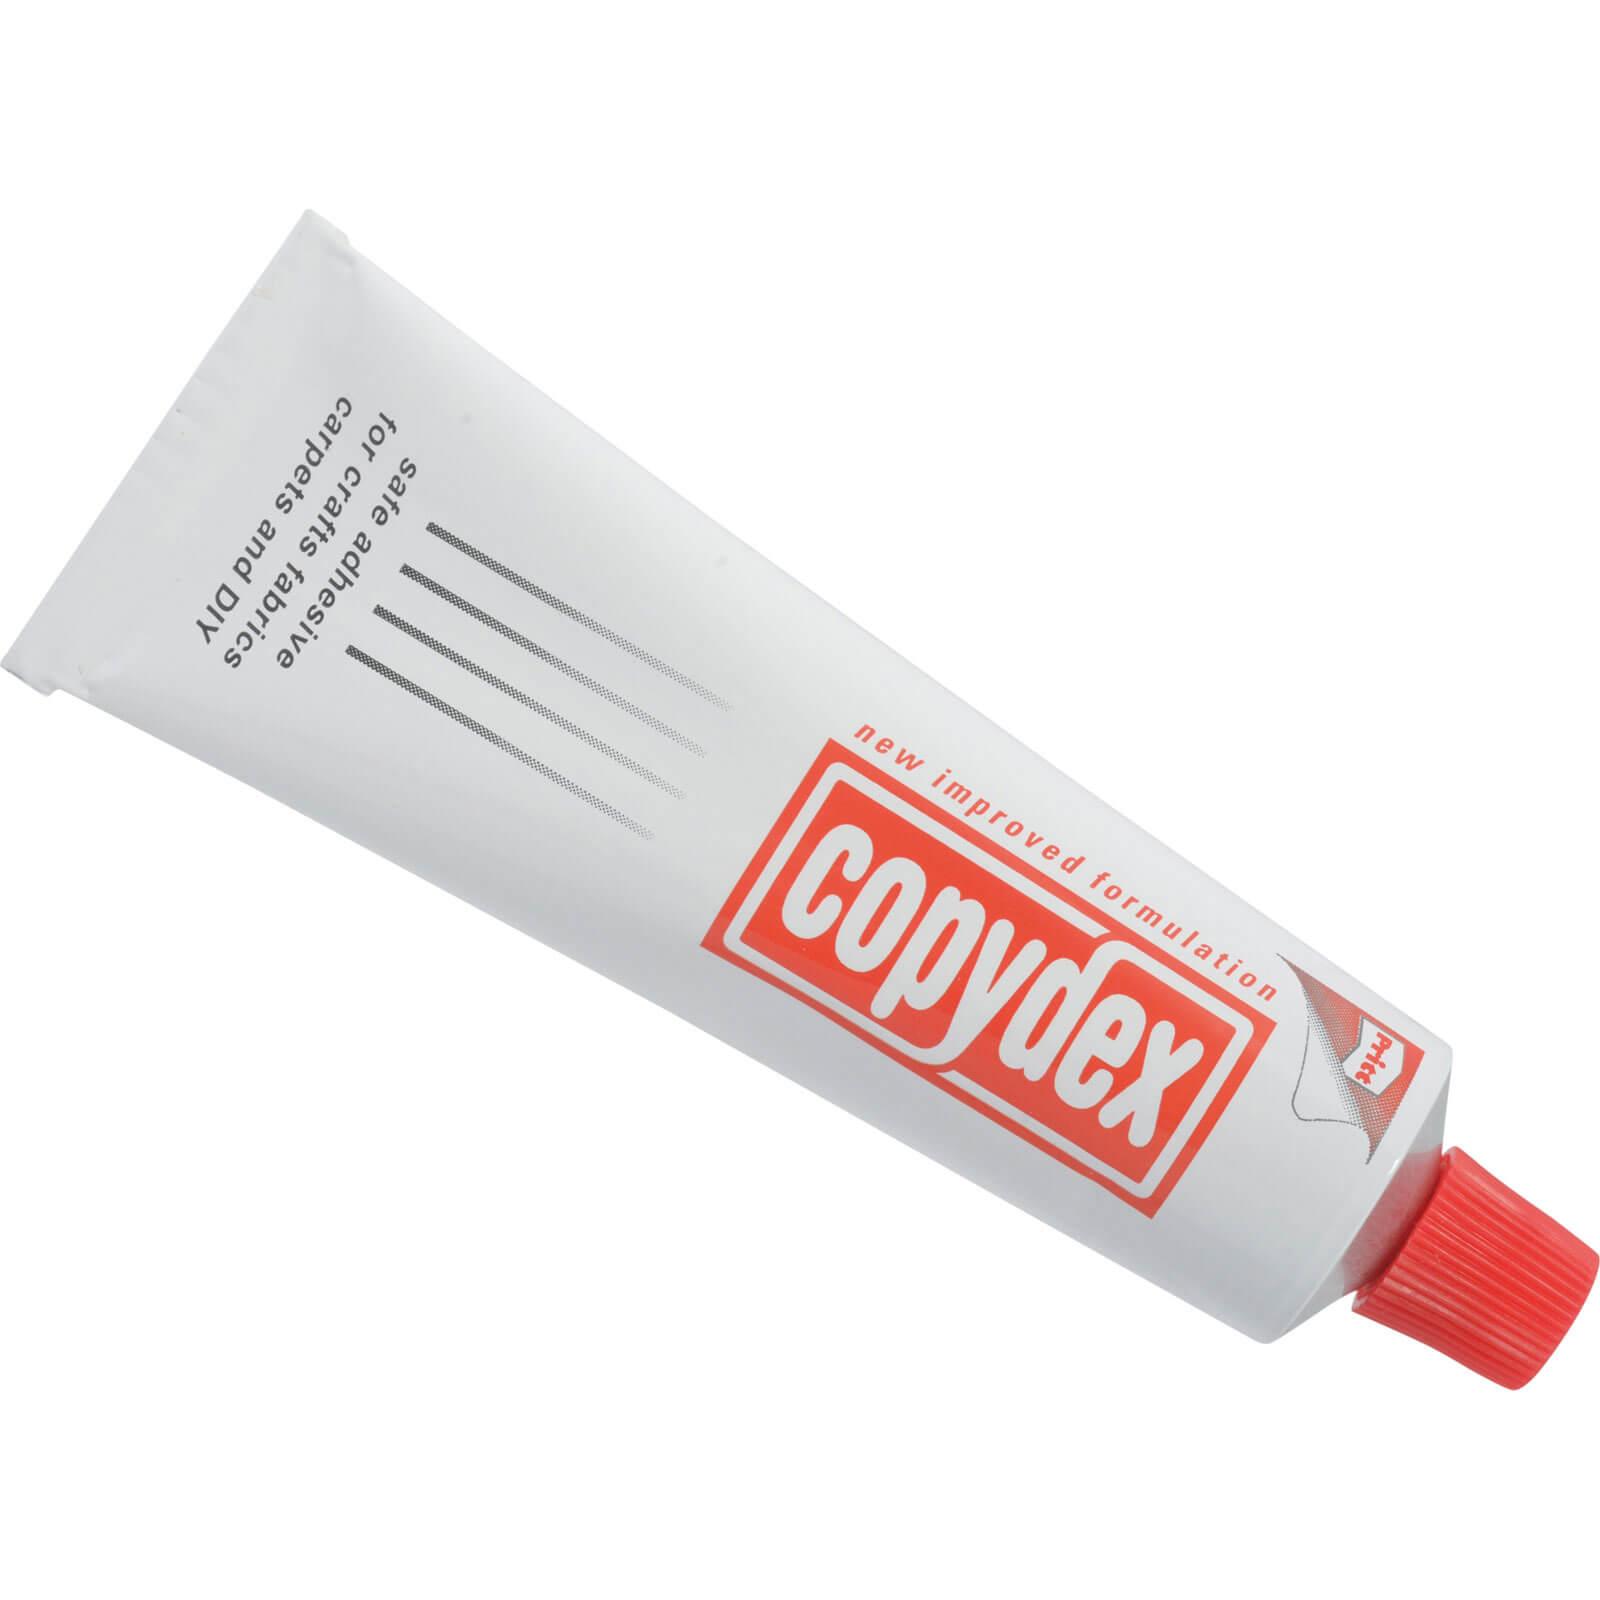 Image of Copydex Adhesive 50ml